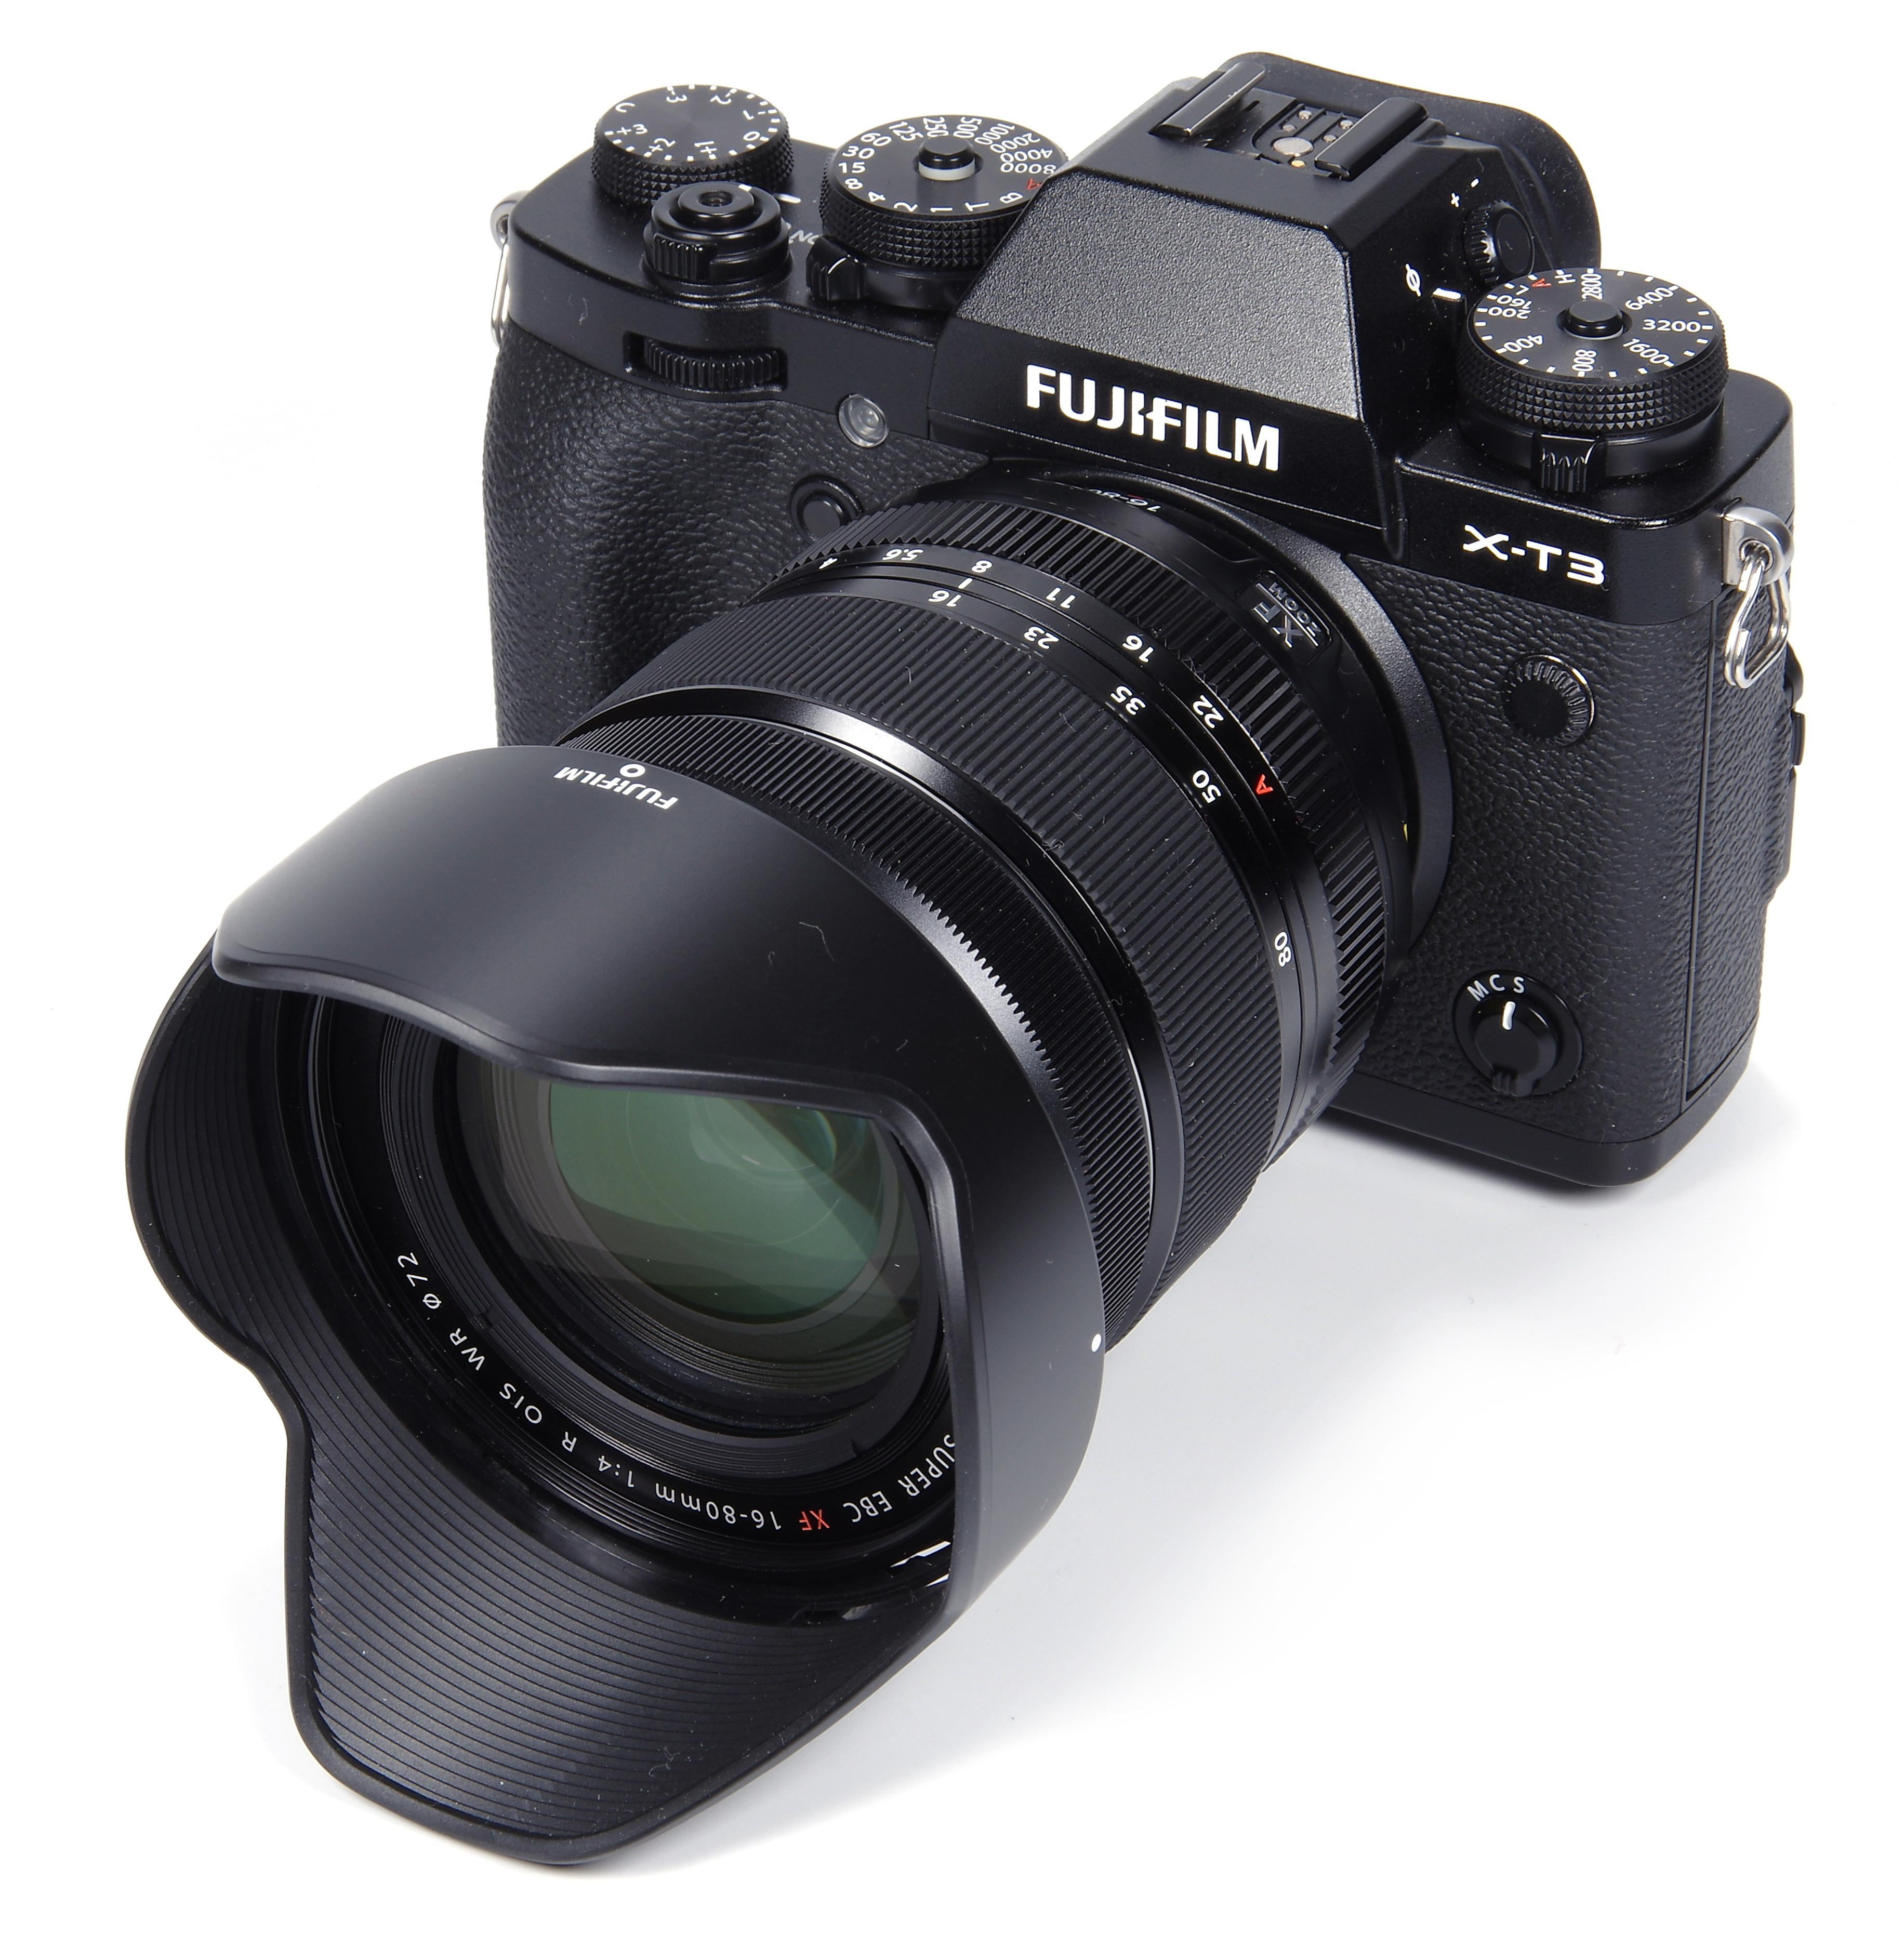 Black with Fujinon XF16-80 mm F4 R WR Optical Image Stabiliser Lens Kit Fujifilm X-T4 Mirrorless Digital Camera